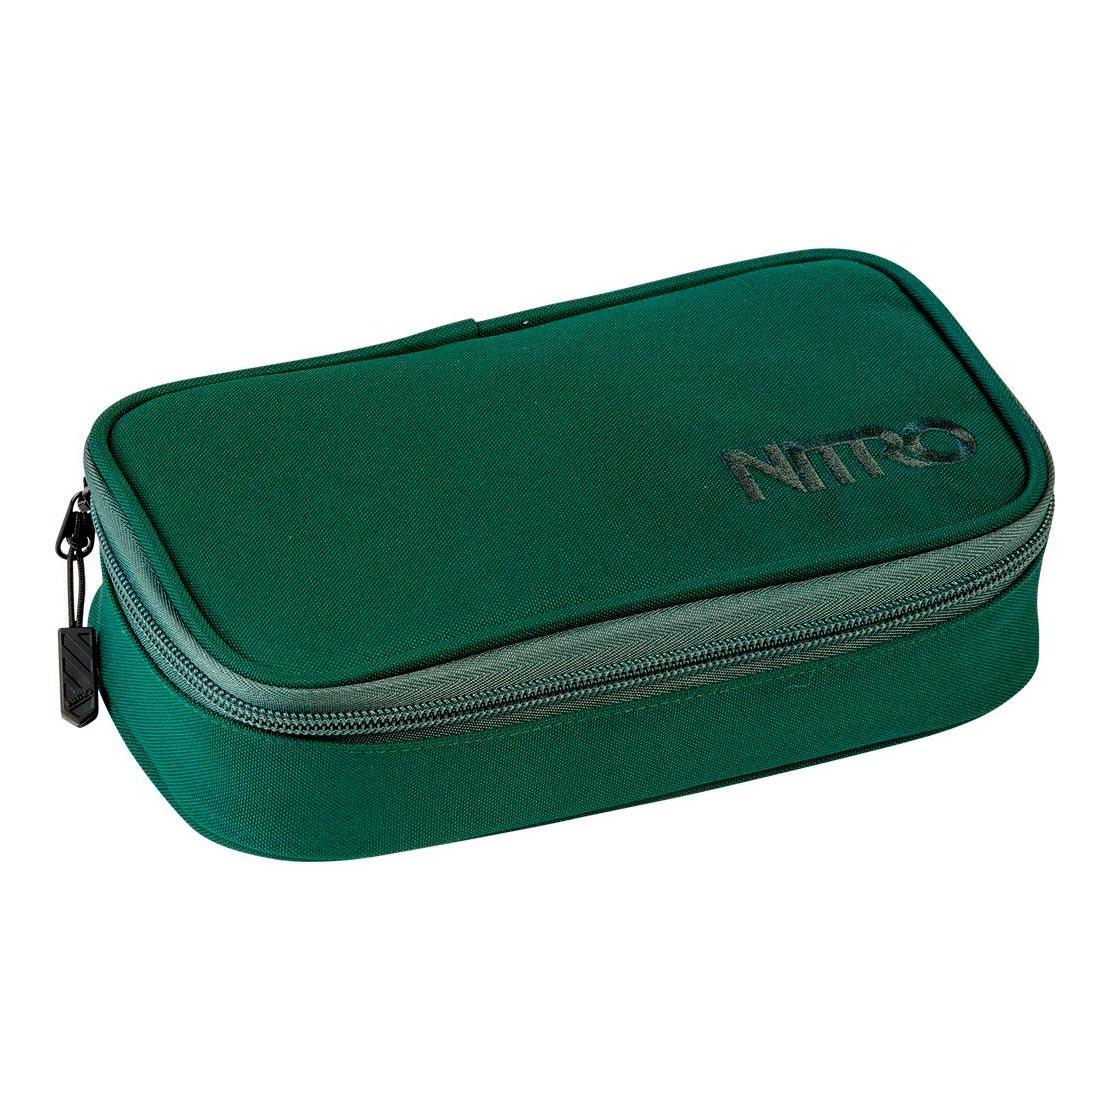 Školní pouzdro Nitro Pencil Case Xl ponderosa